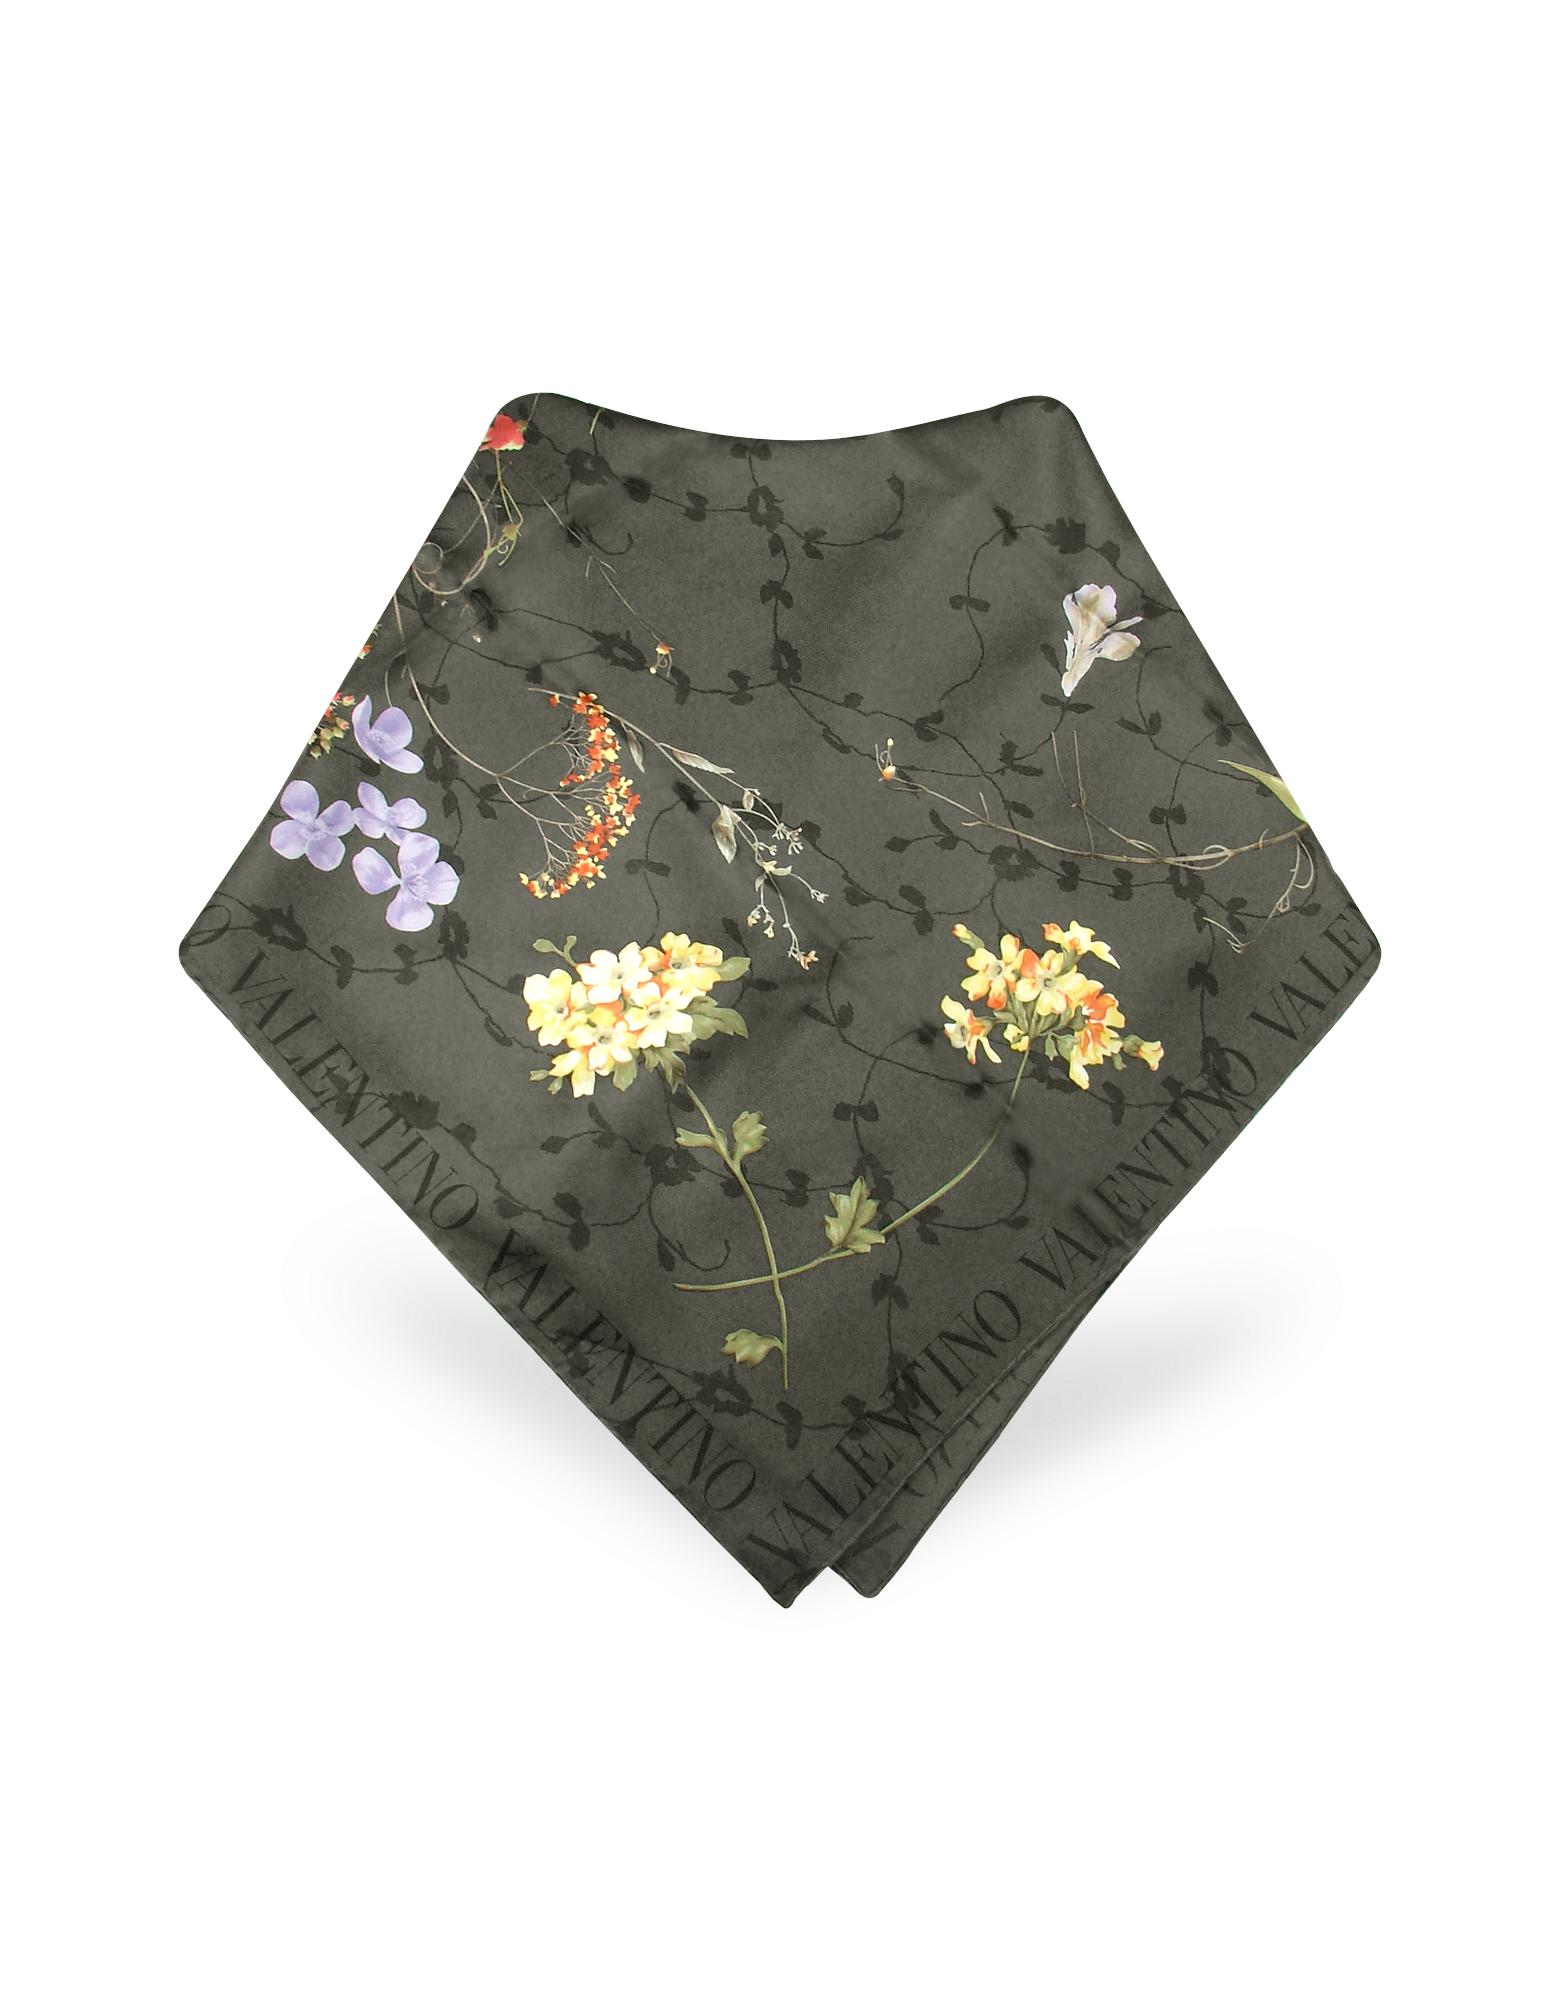 Valentino Garavani  Ornamental Floral Printed Silk Square Scarf